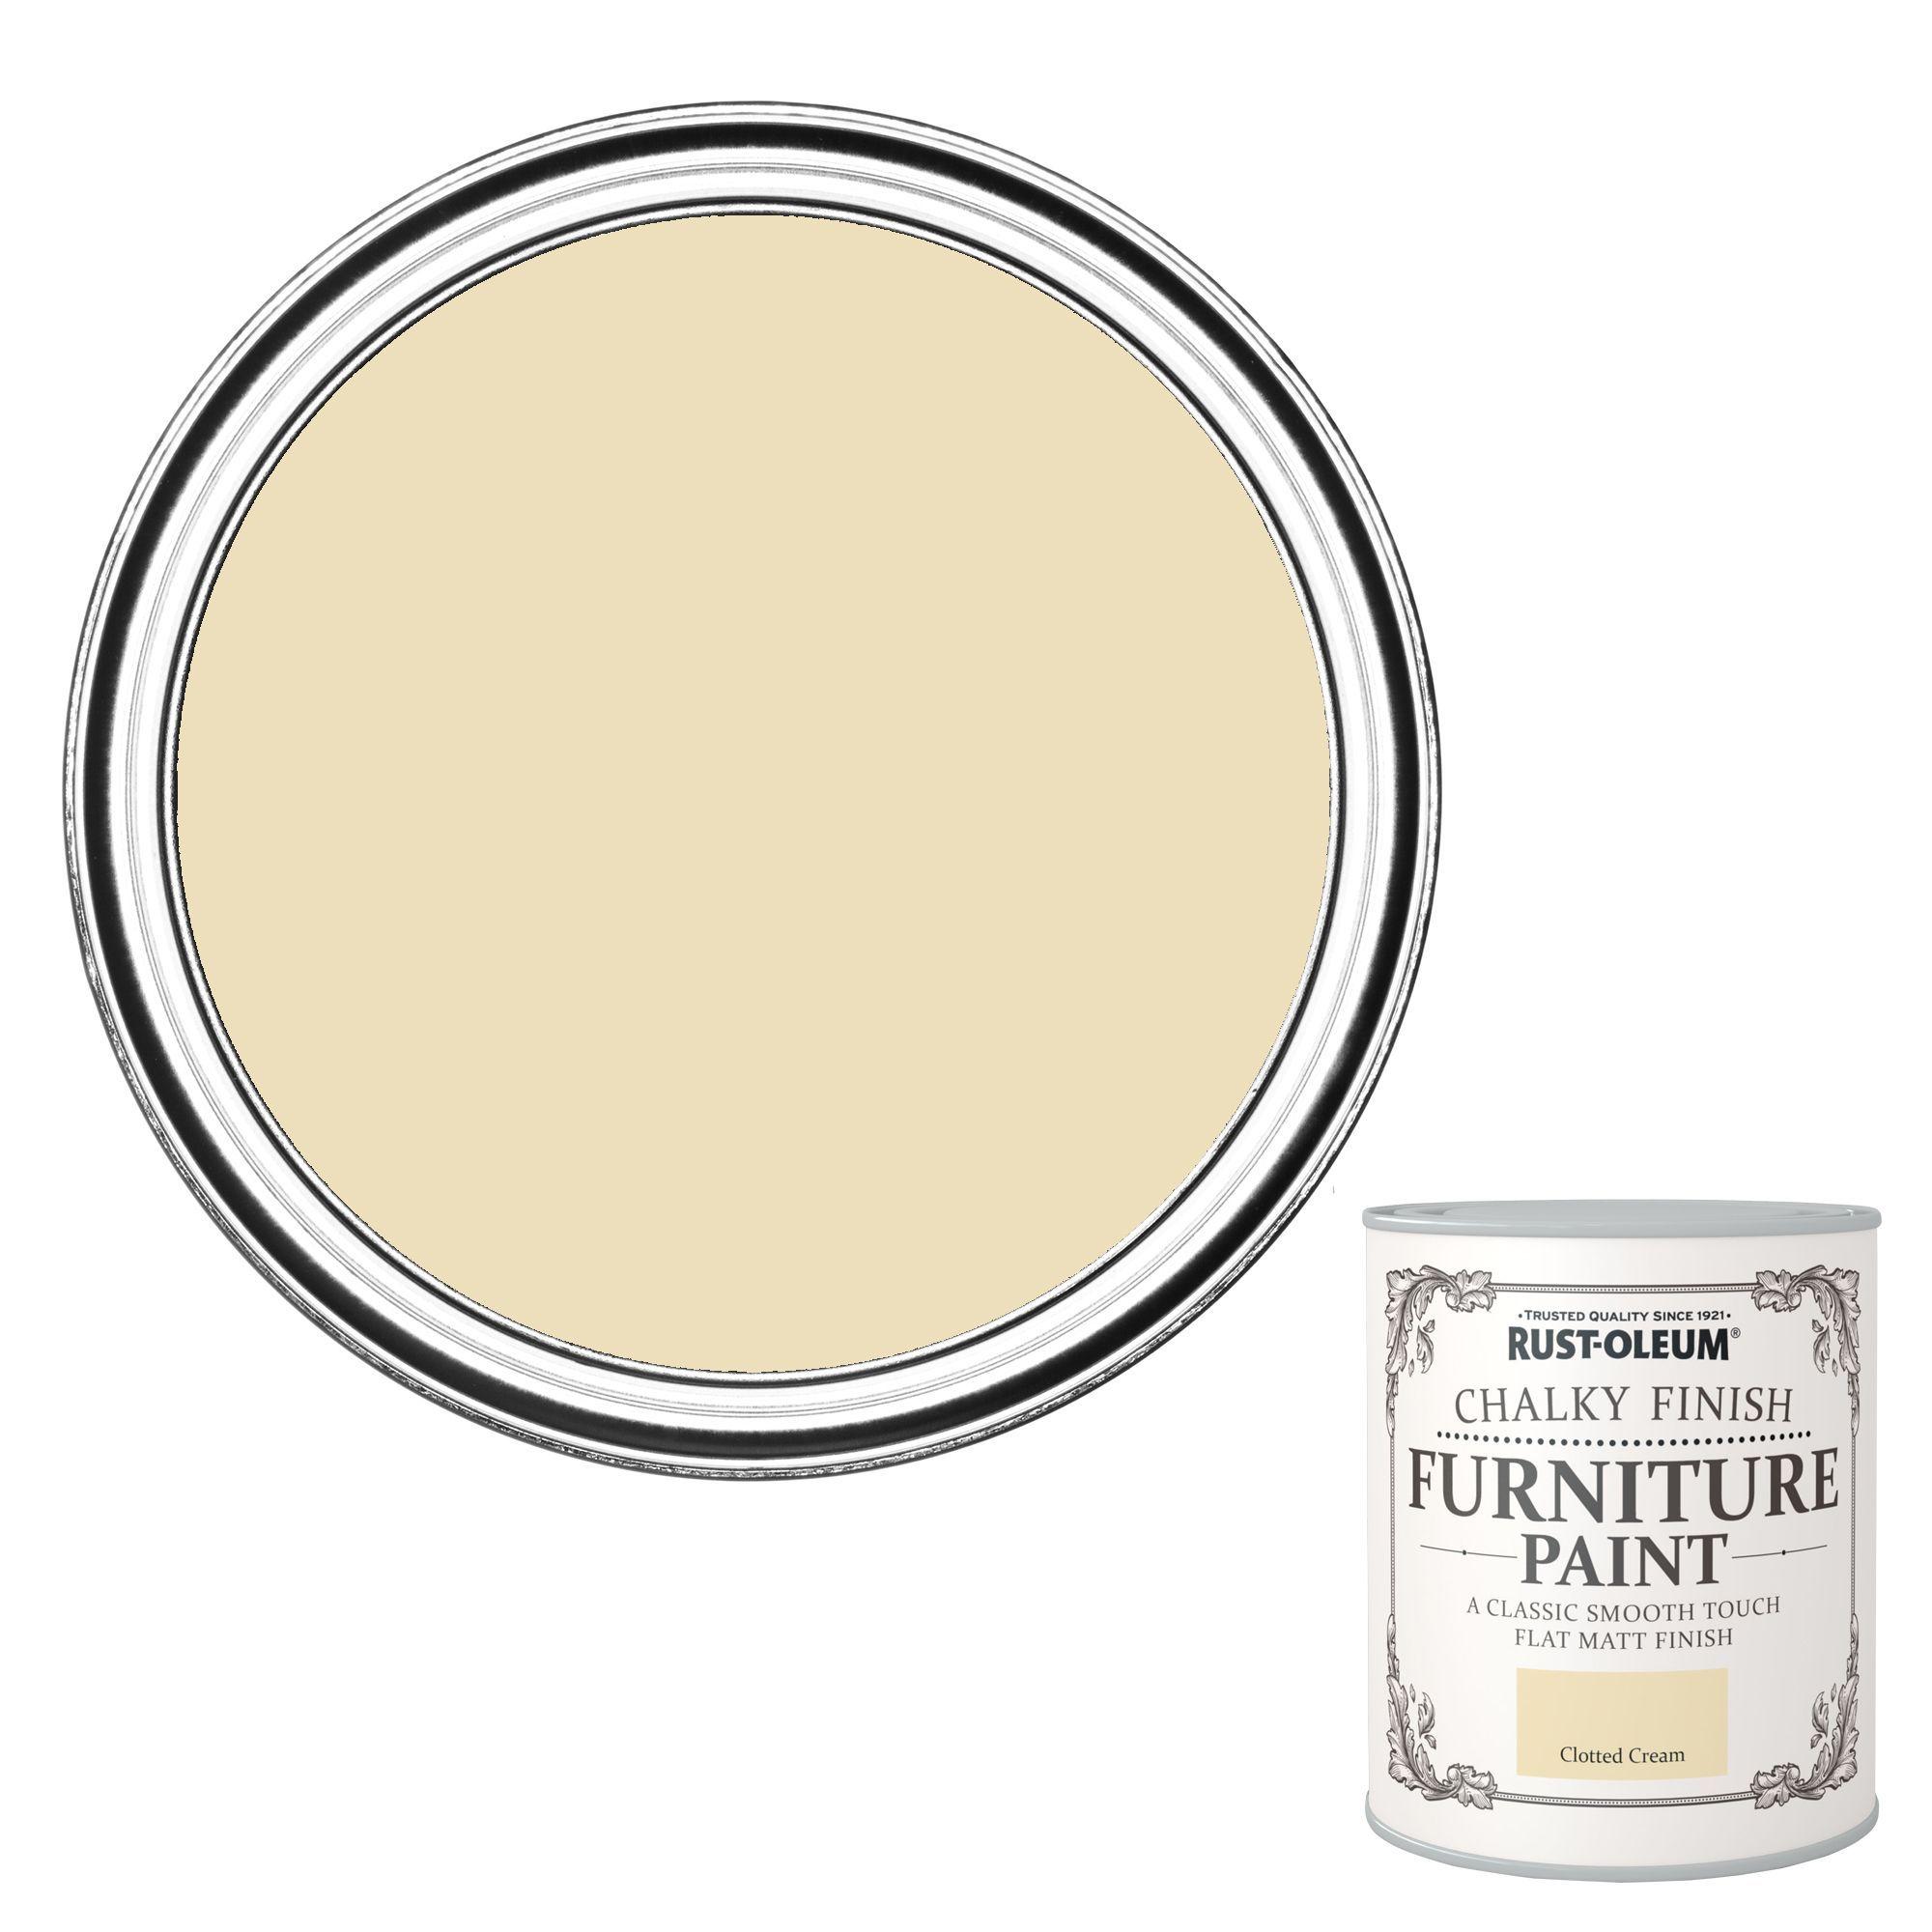 Rust Oleum Chalky Finish Clotted Cream Furniture Paint 2 5l Departments Diy At B Q Rustoleum Painted Furniture Cream Furniture